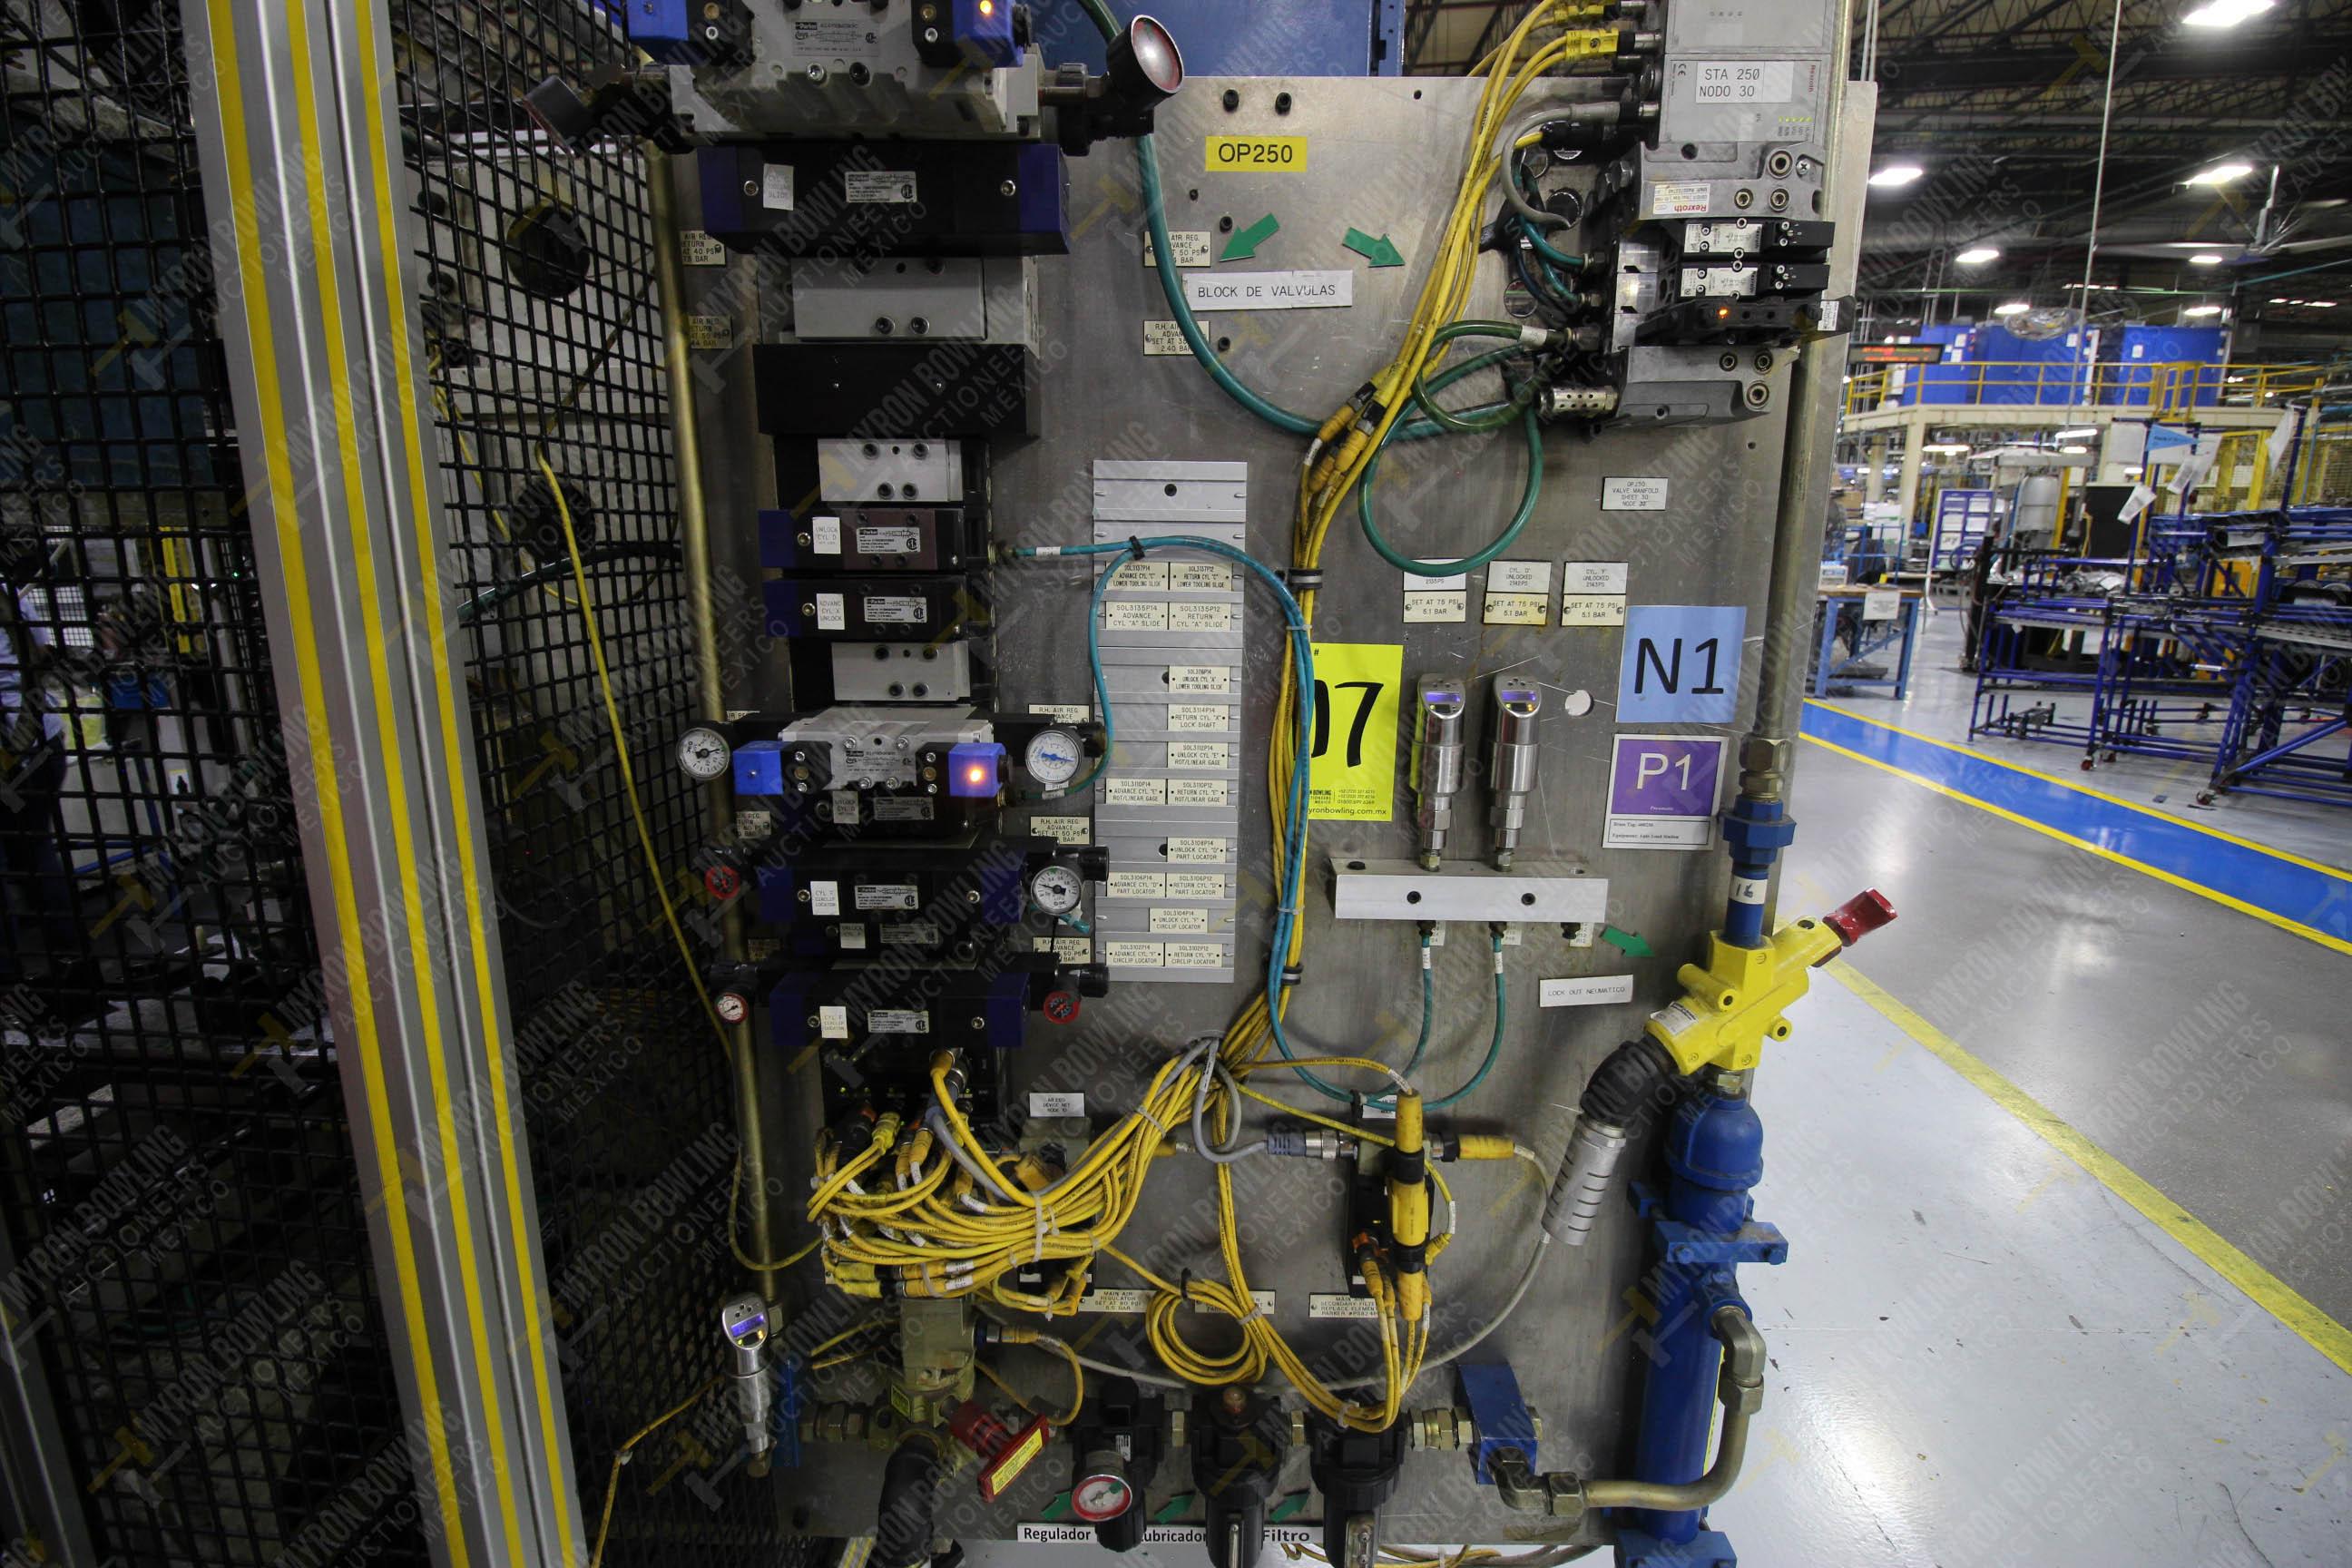 Estación semiautomática para operación 250 de ensamble de candado, contiene - Image 15 of 21